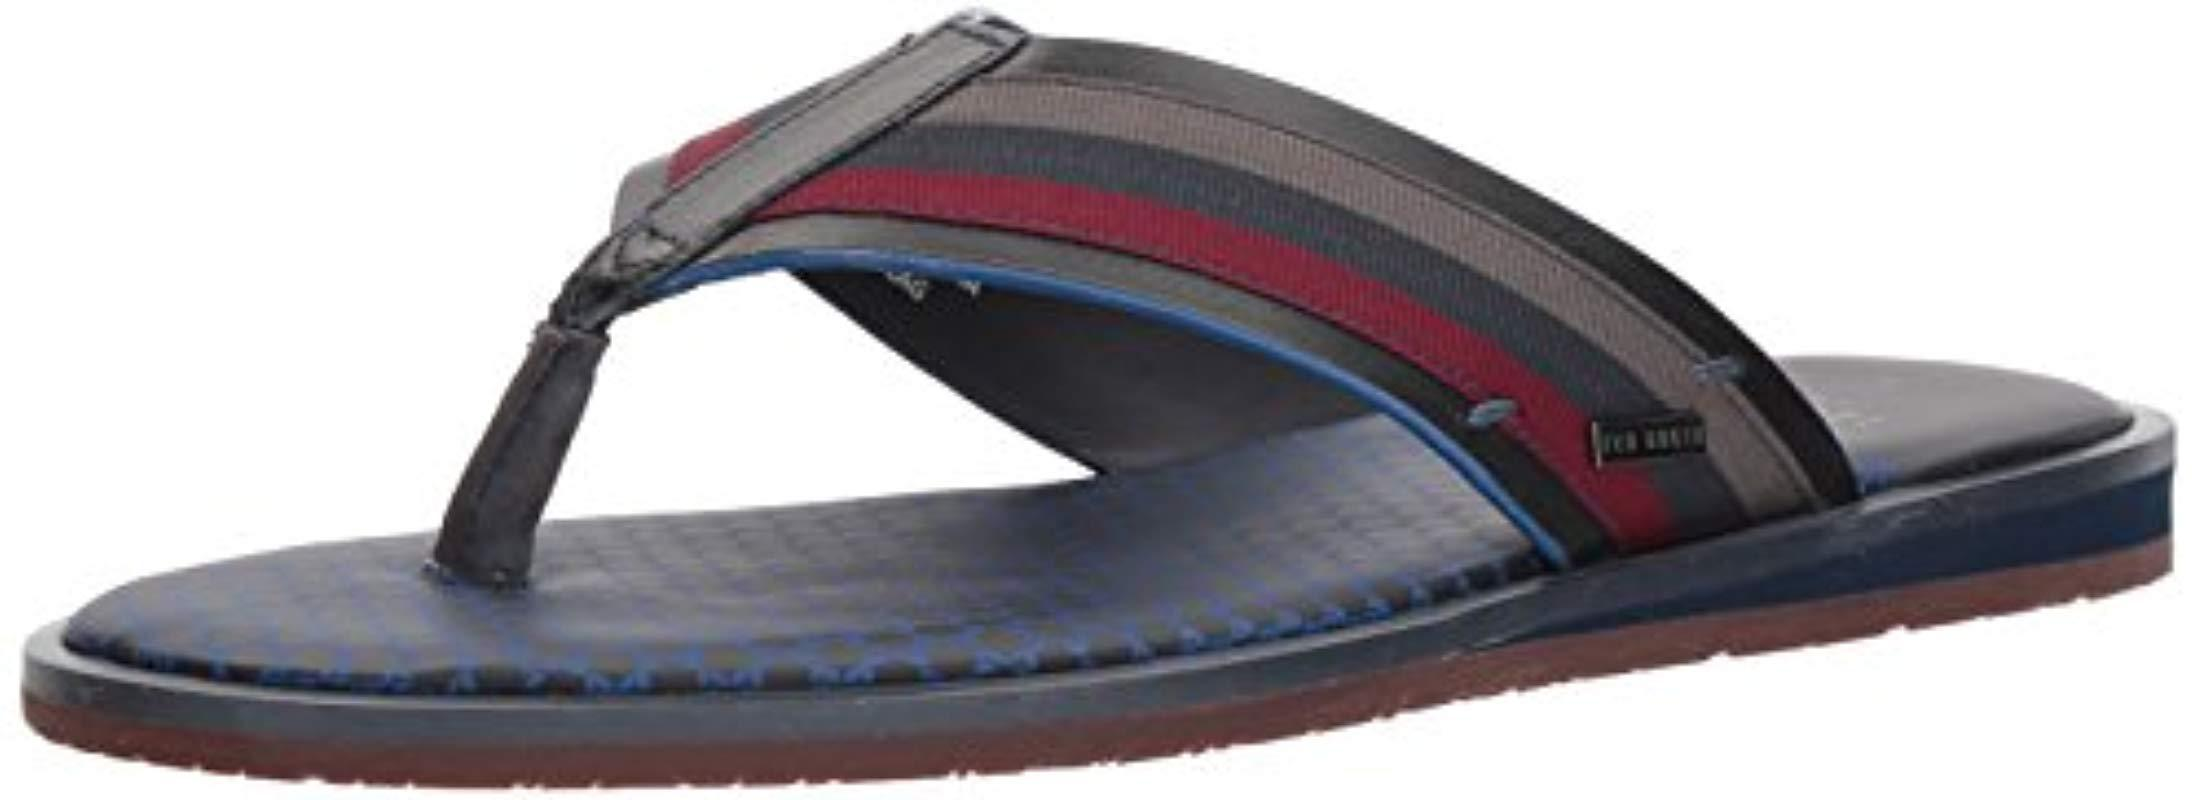 480441ab69bb Ted Baker - Blue Knowlun Flip-flop for Men - Lyst. View fullscreen